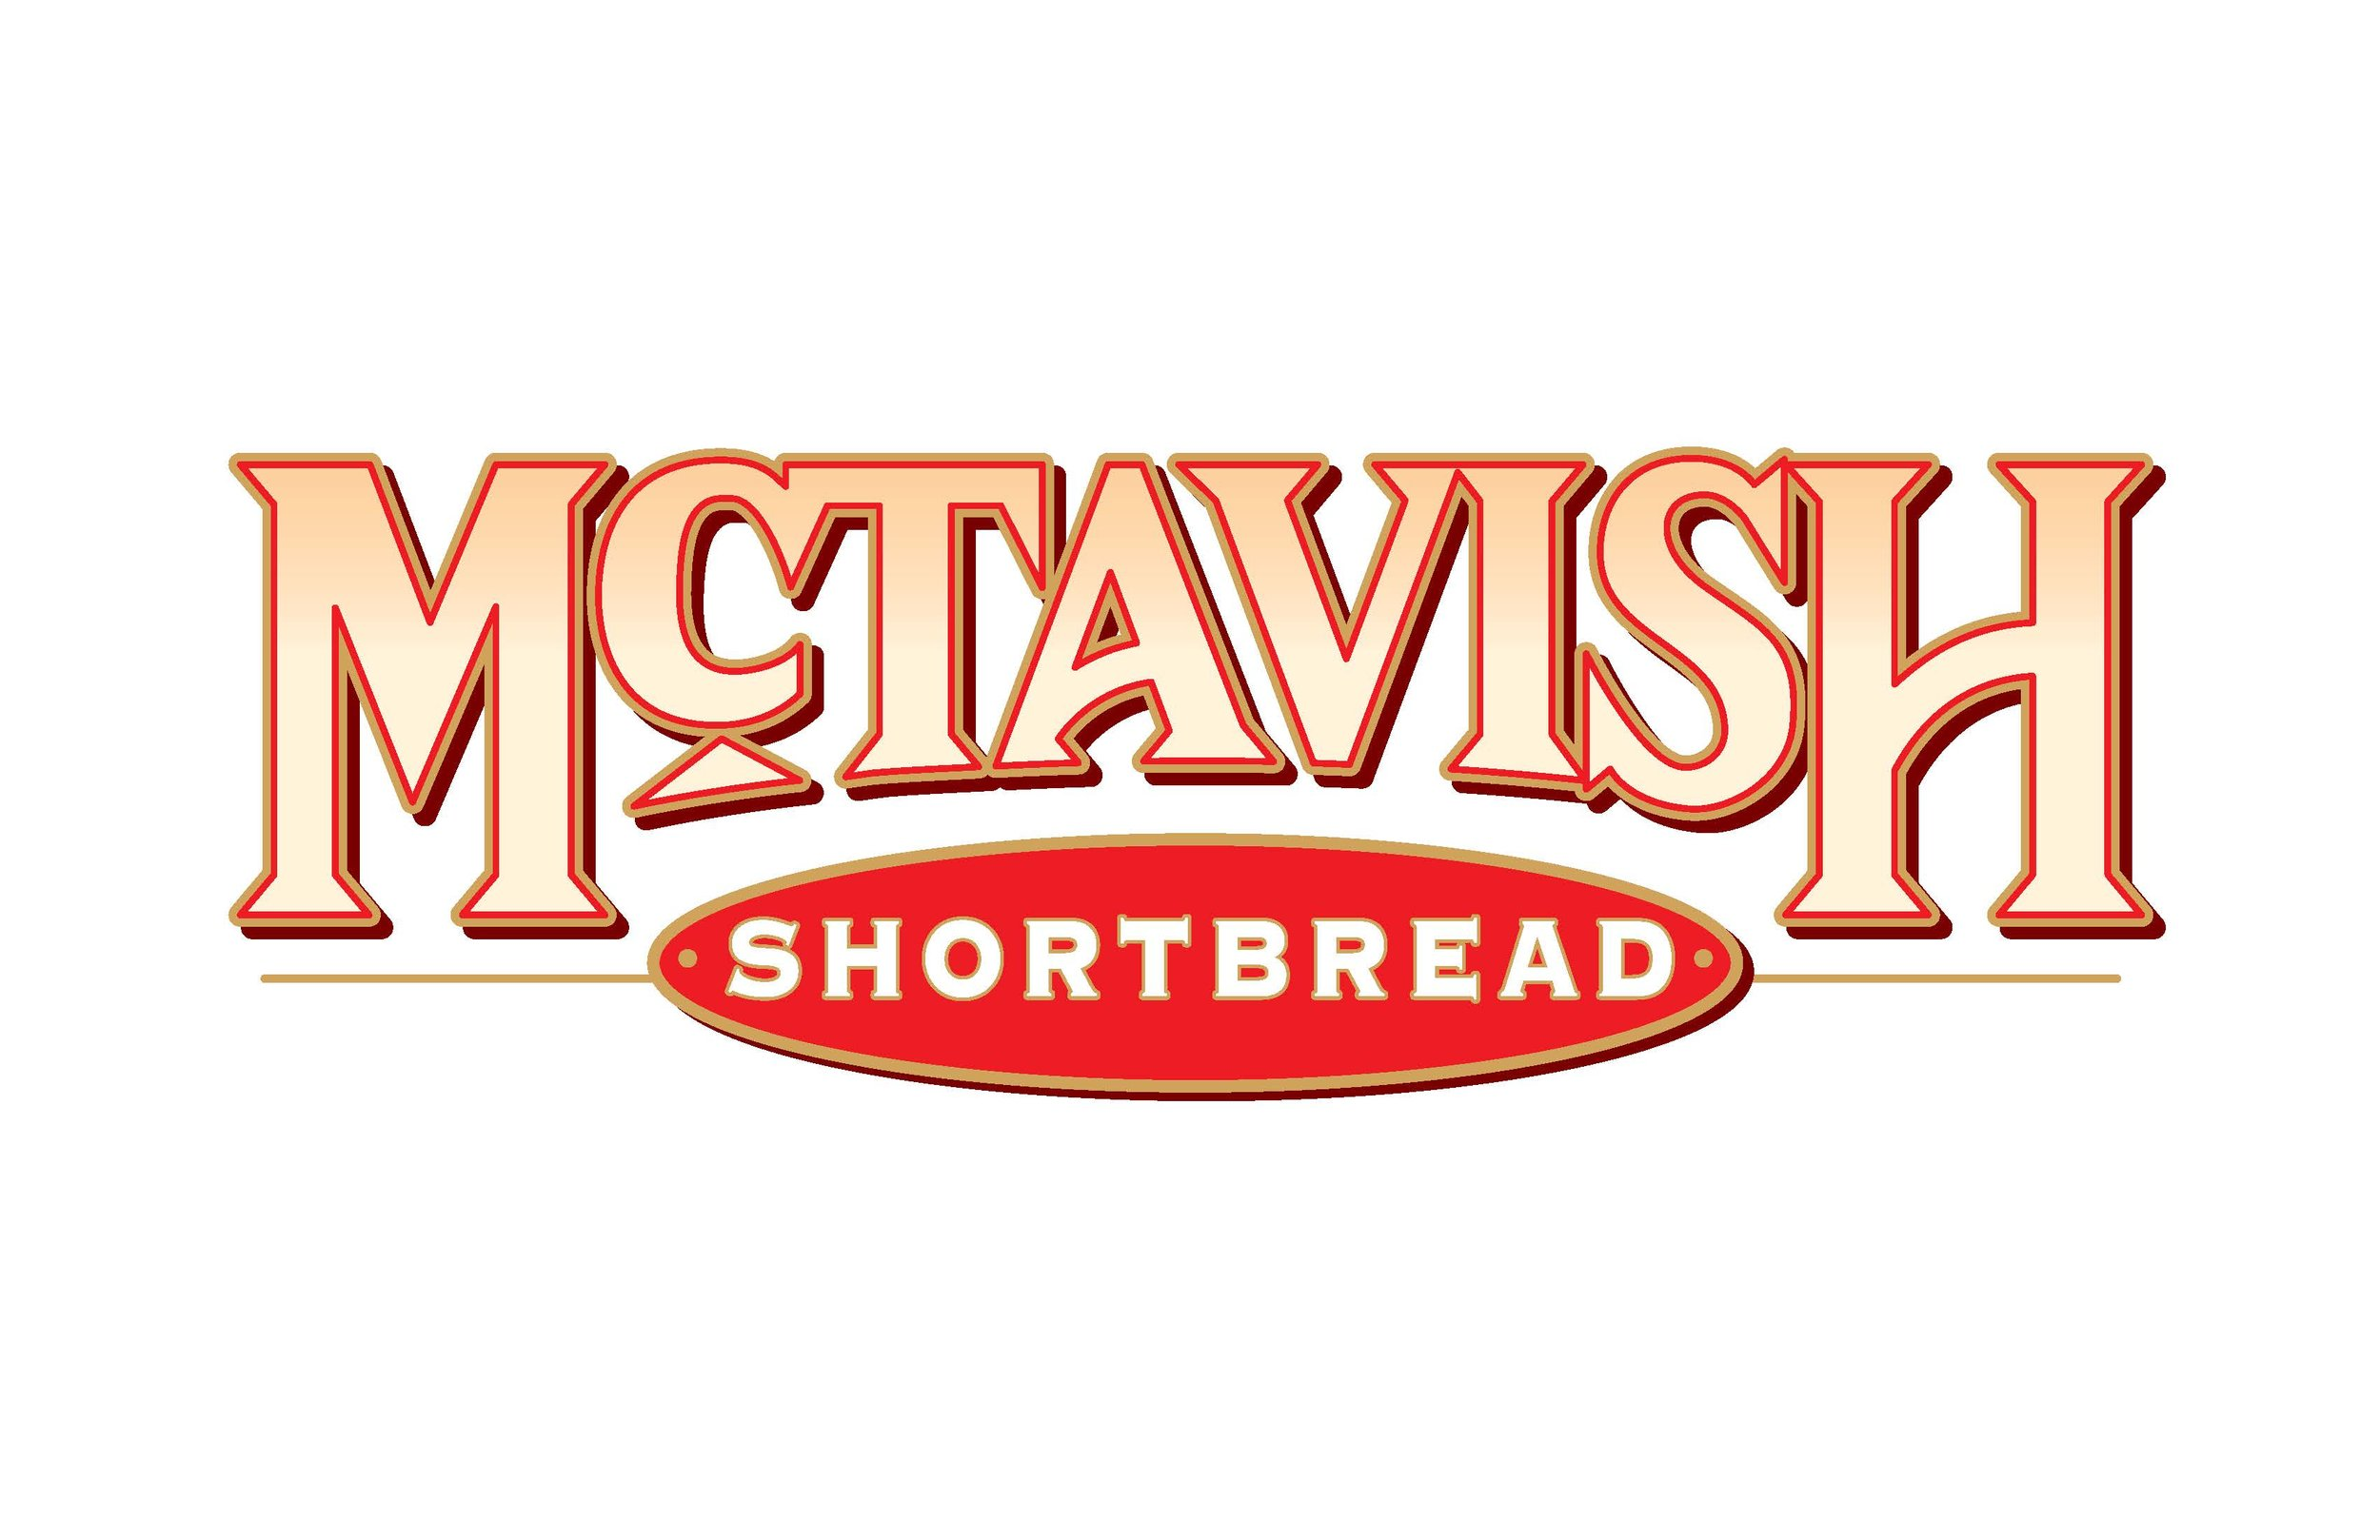 McTavish Shortbread